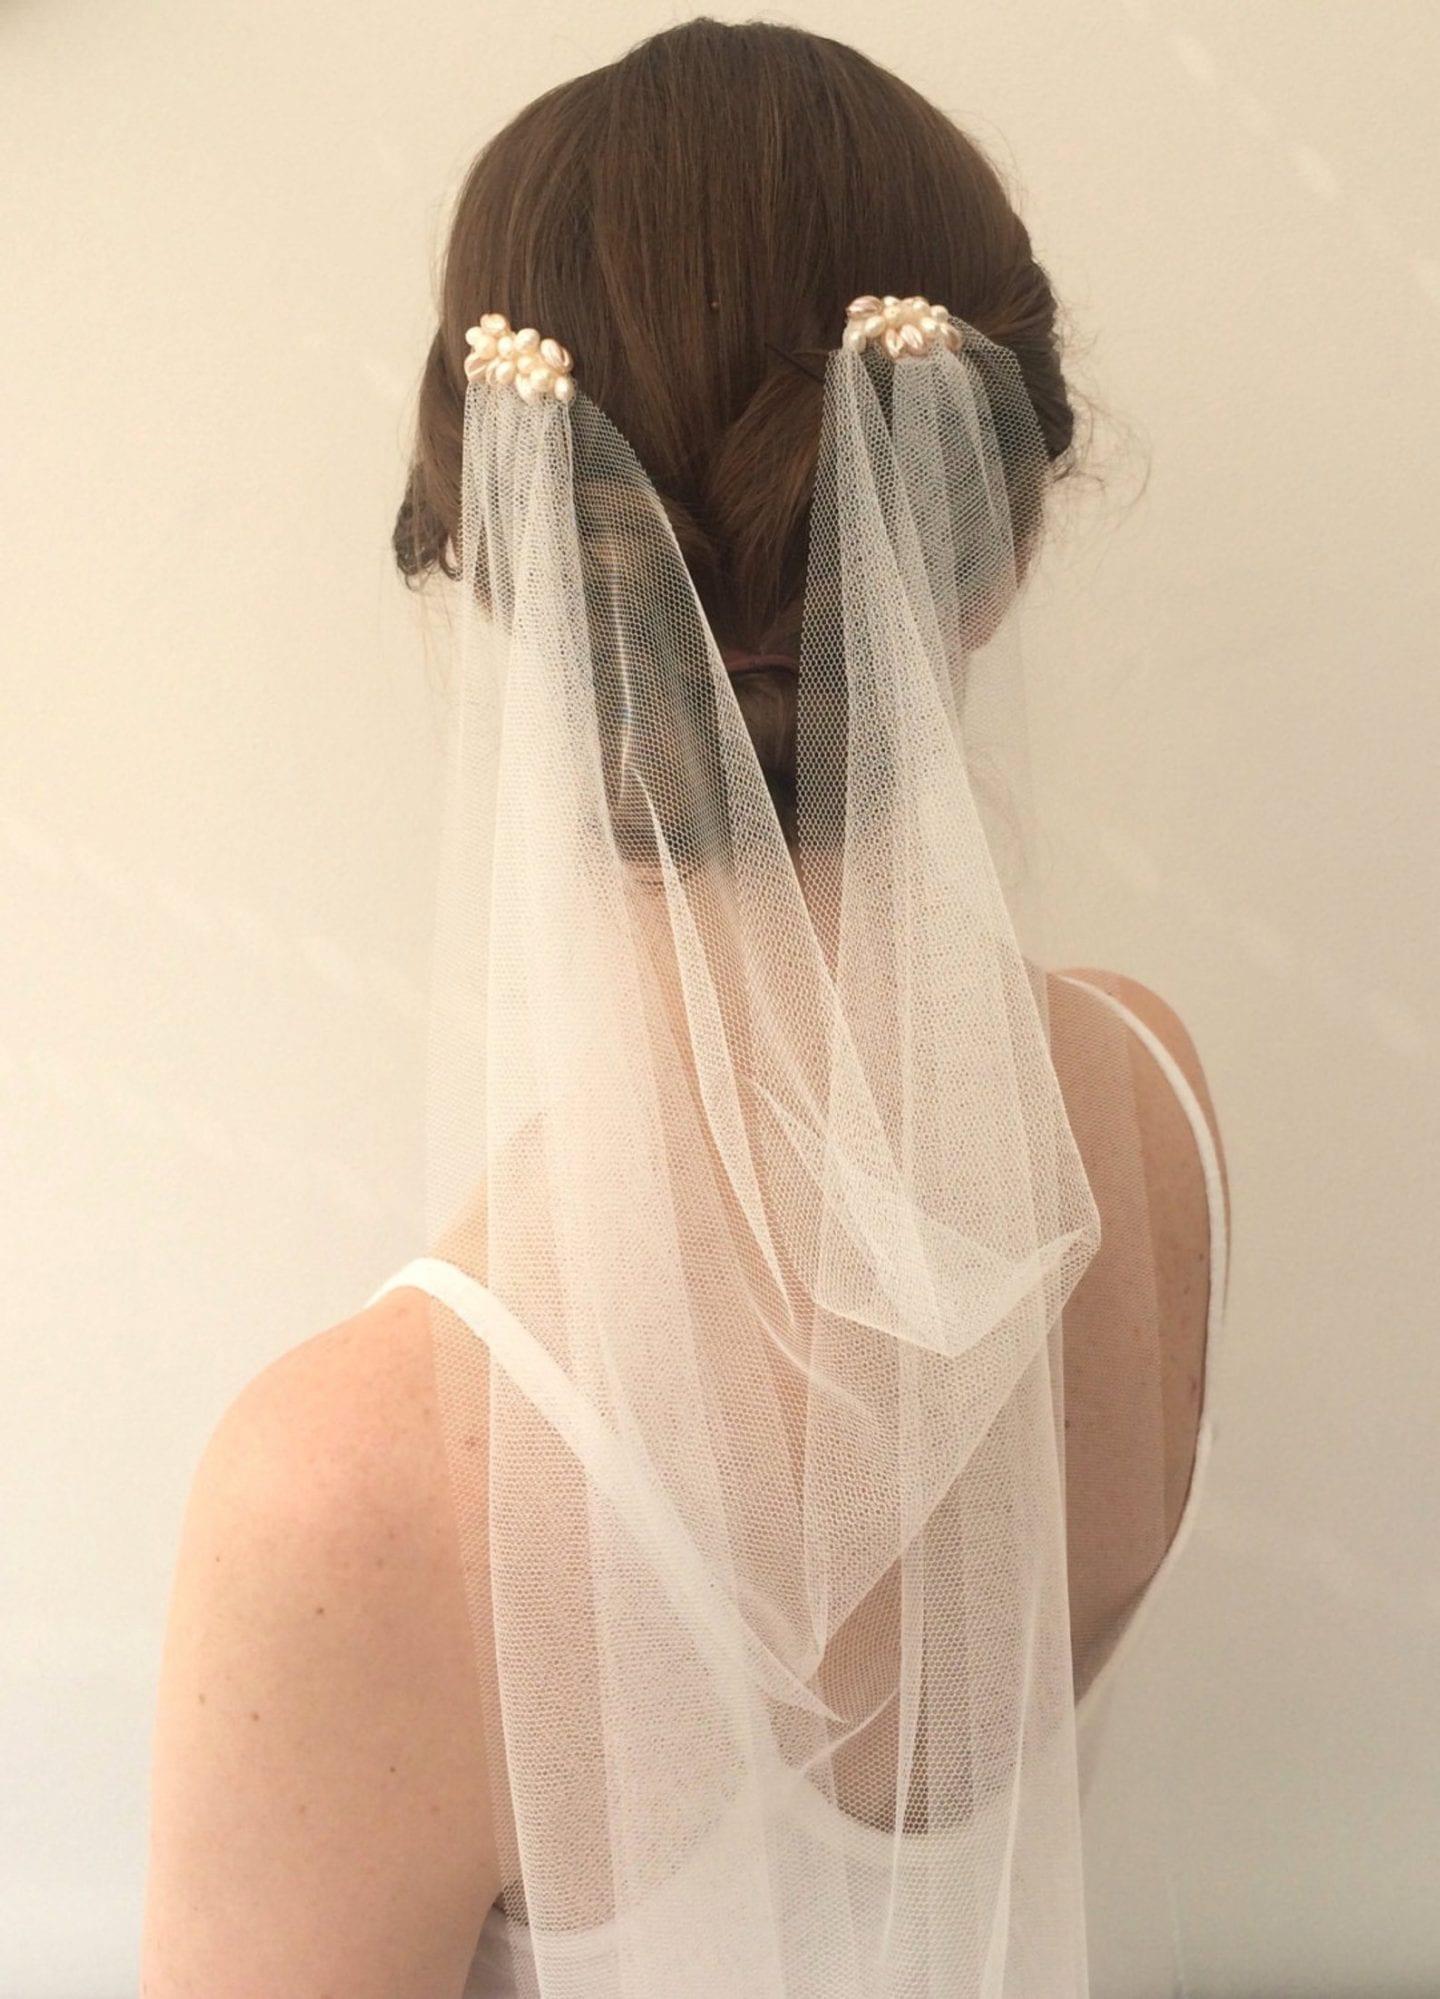 Silk tulle vintage wedding veil